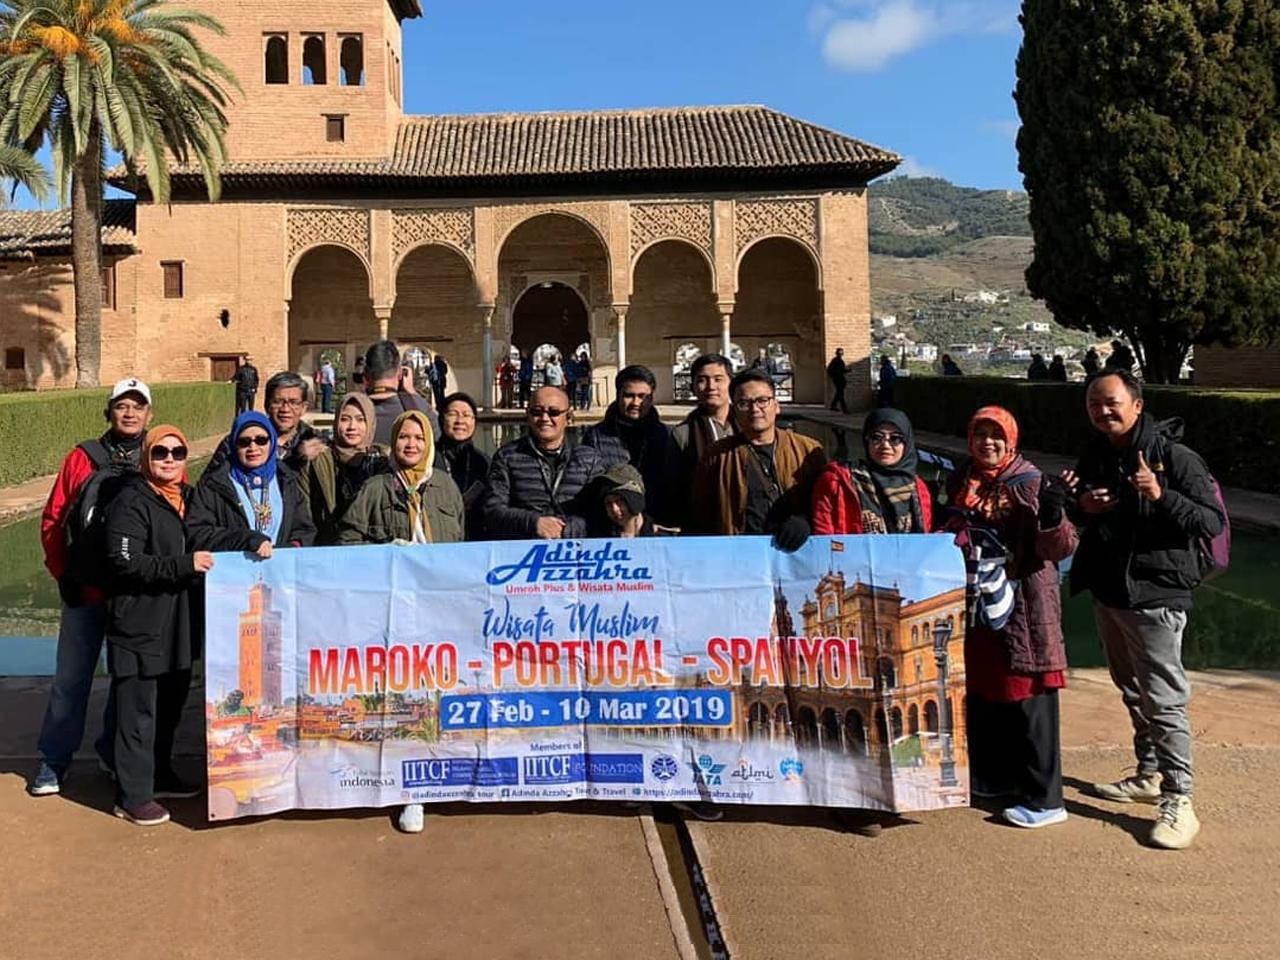 Wisata Maroko Spanyol